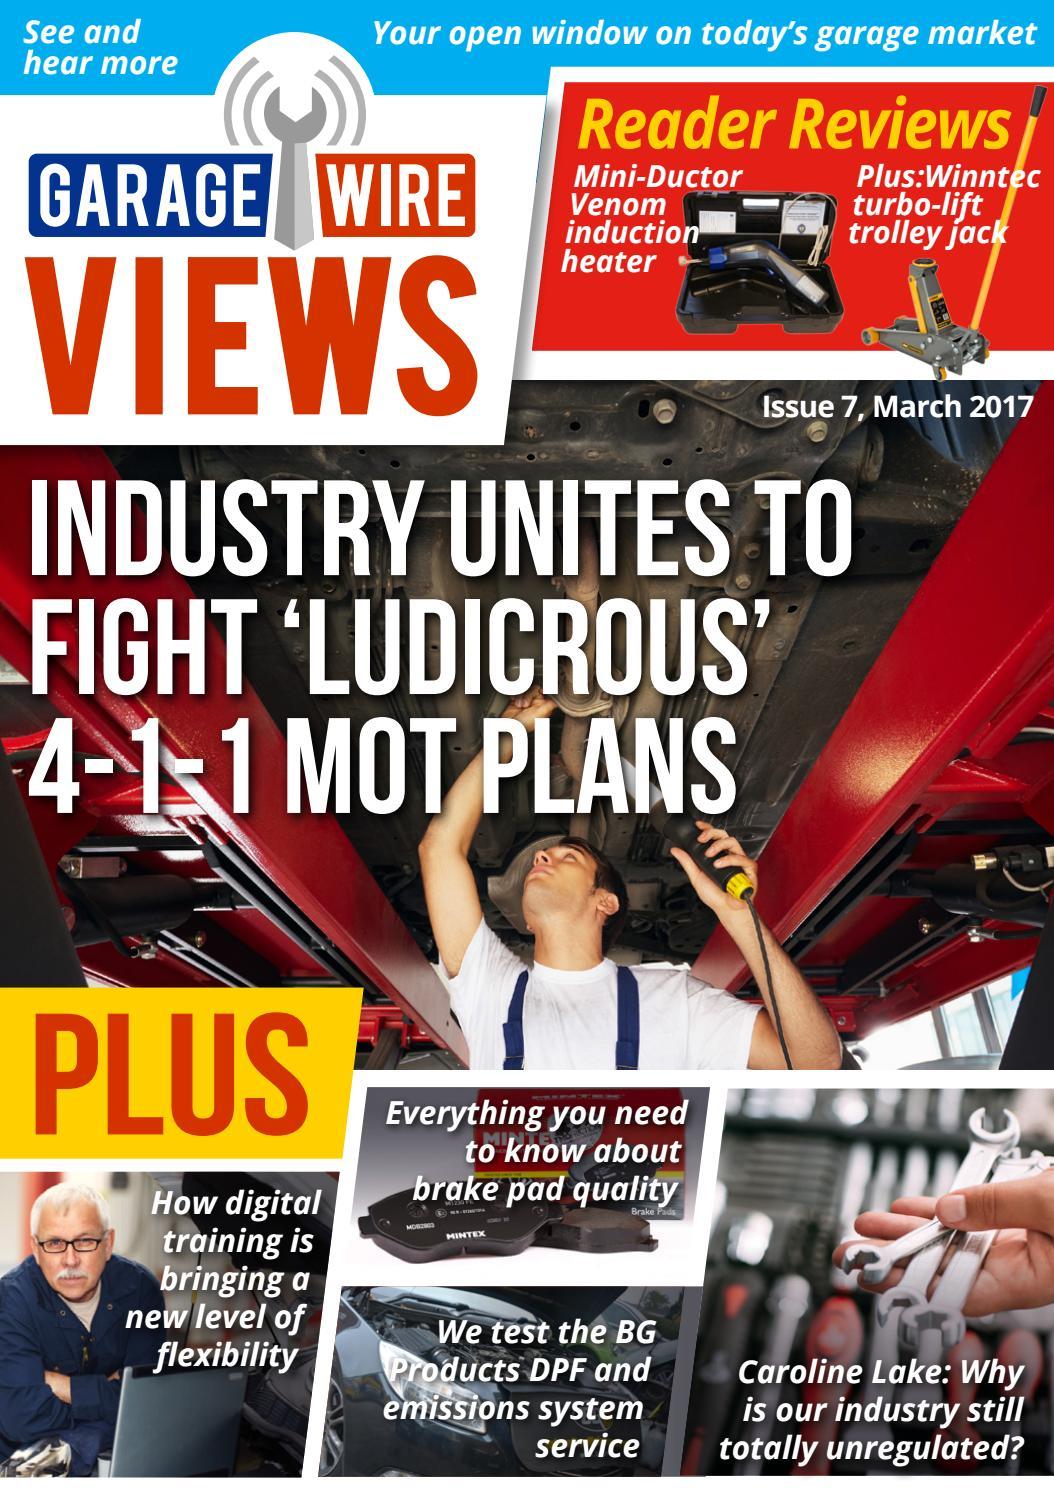 Gw Views Issue 7 Mar 17 By Garage Wire Issuu